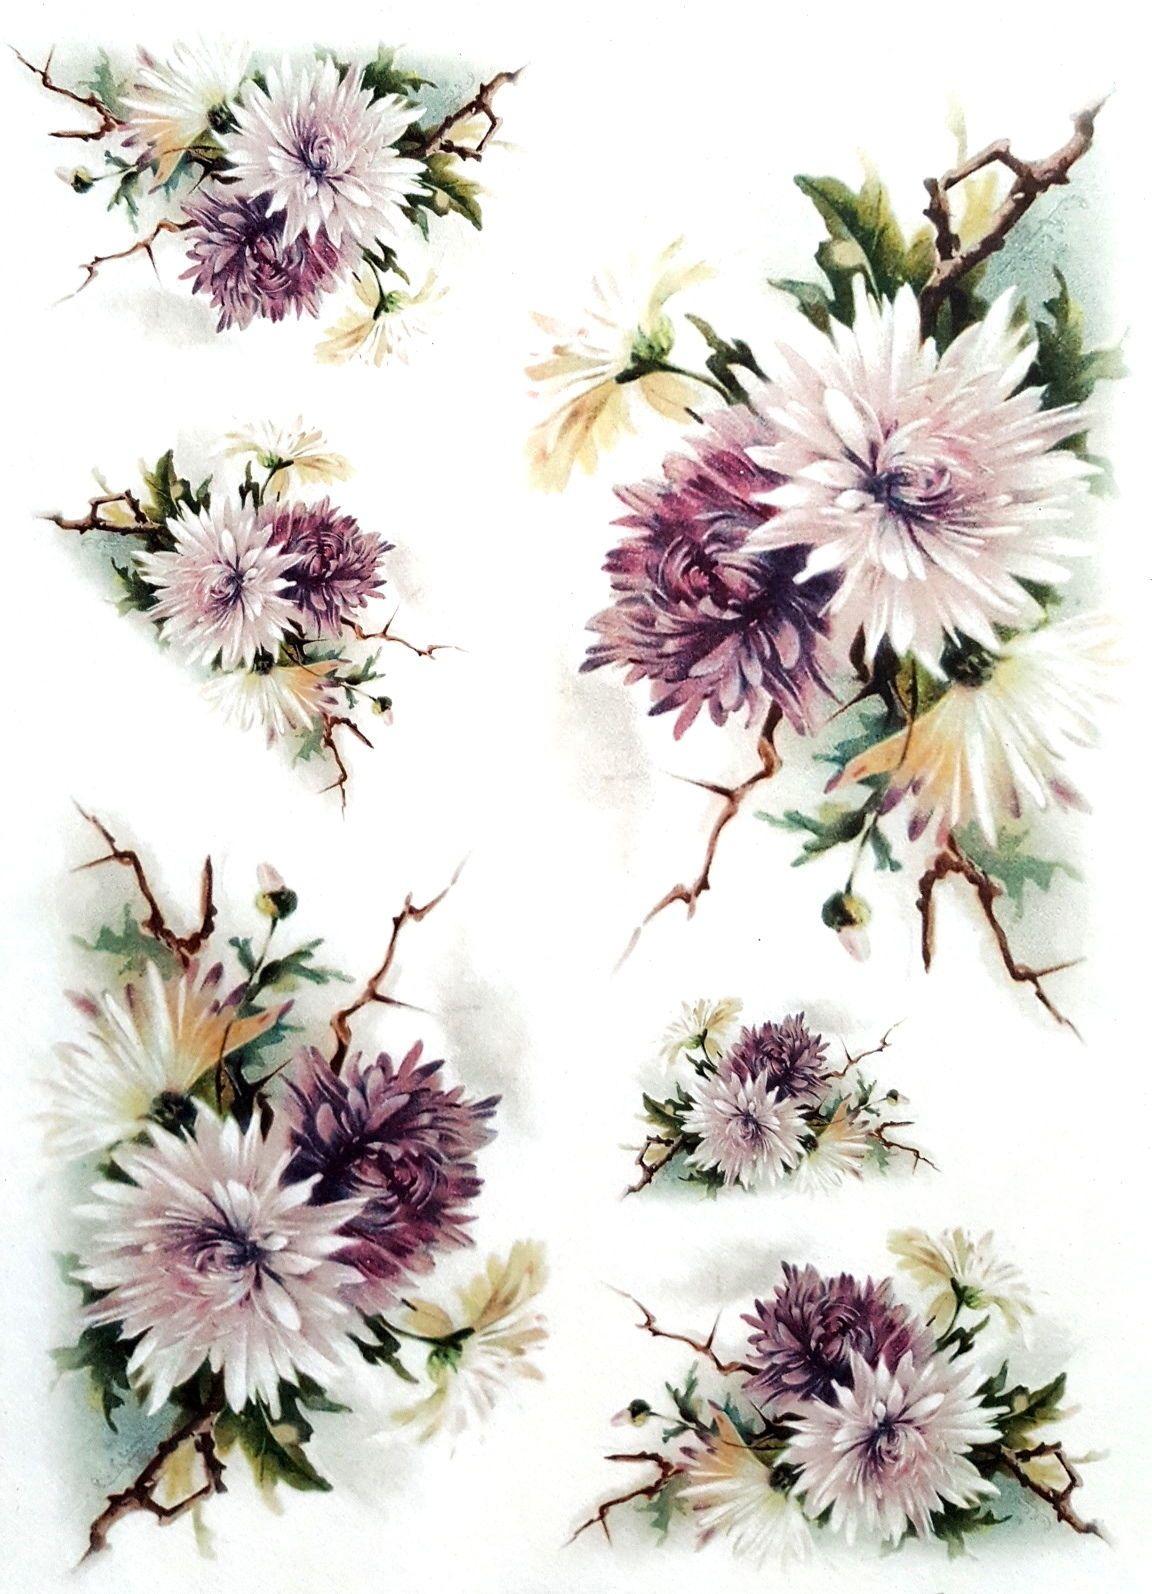 Rice Paper for Decoupage Scrapbooking Sheet Craft Vintage Garden Flowers 1/3 | eBay